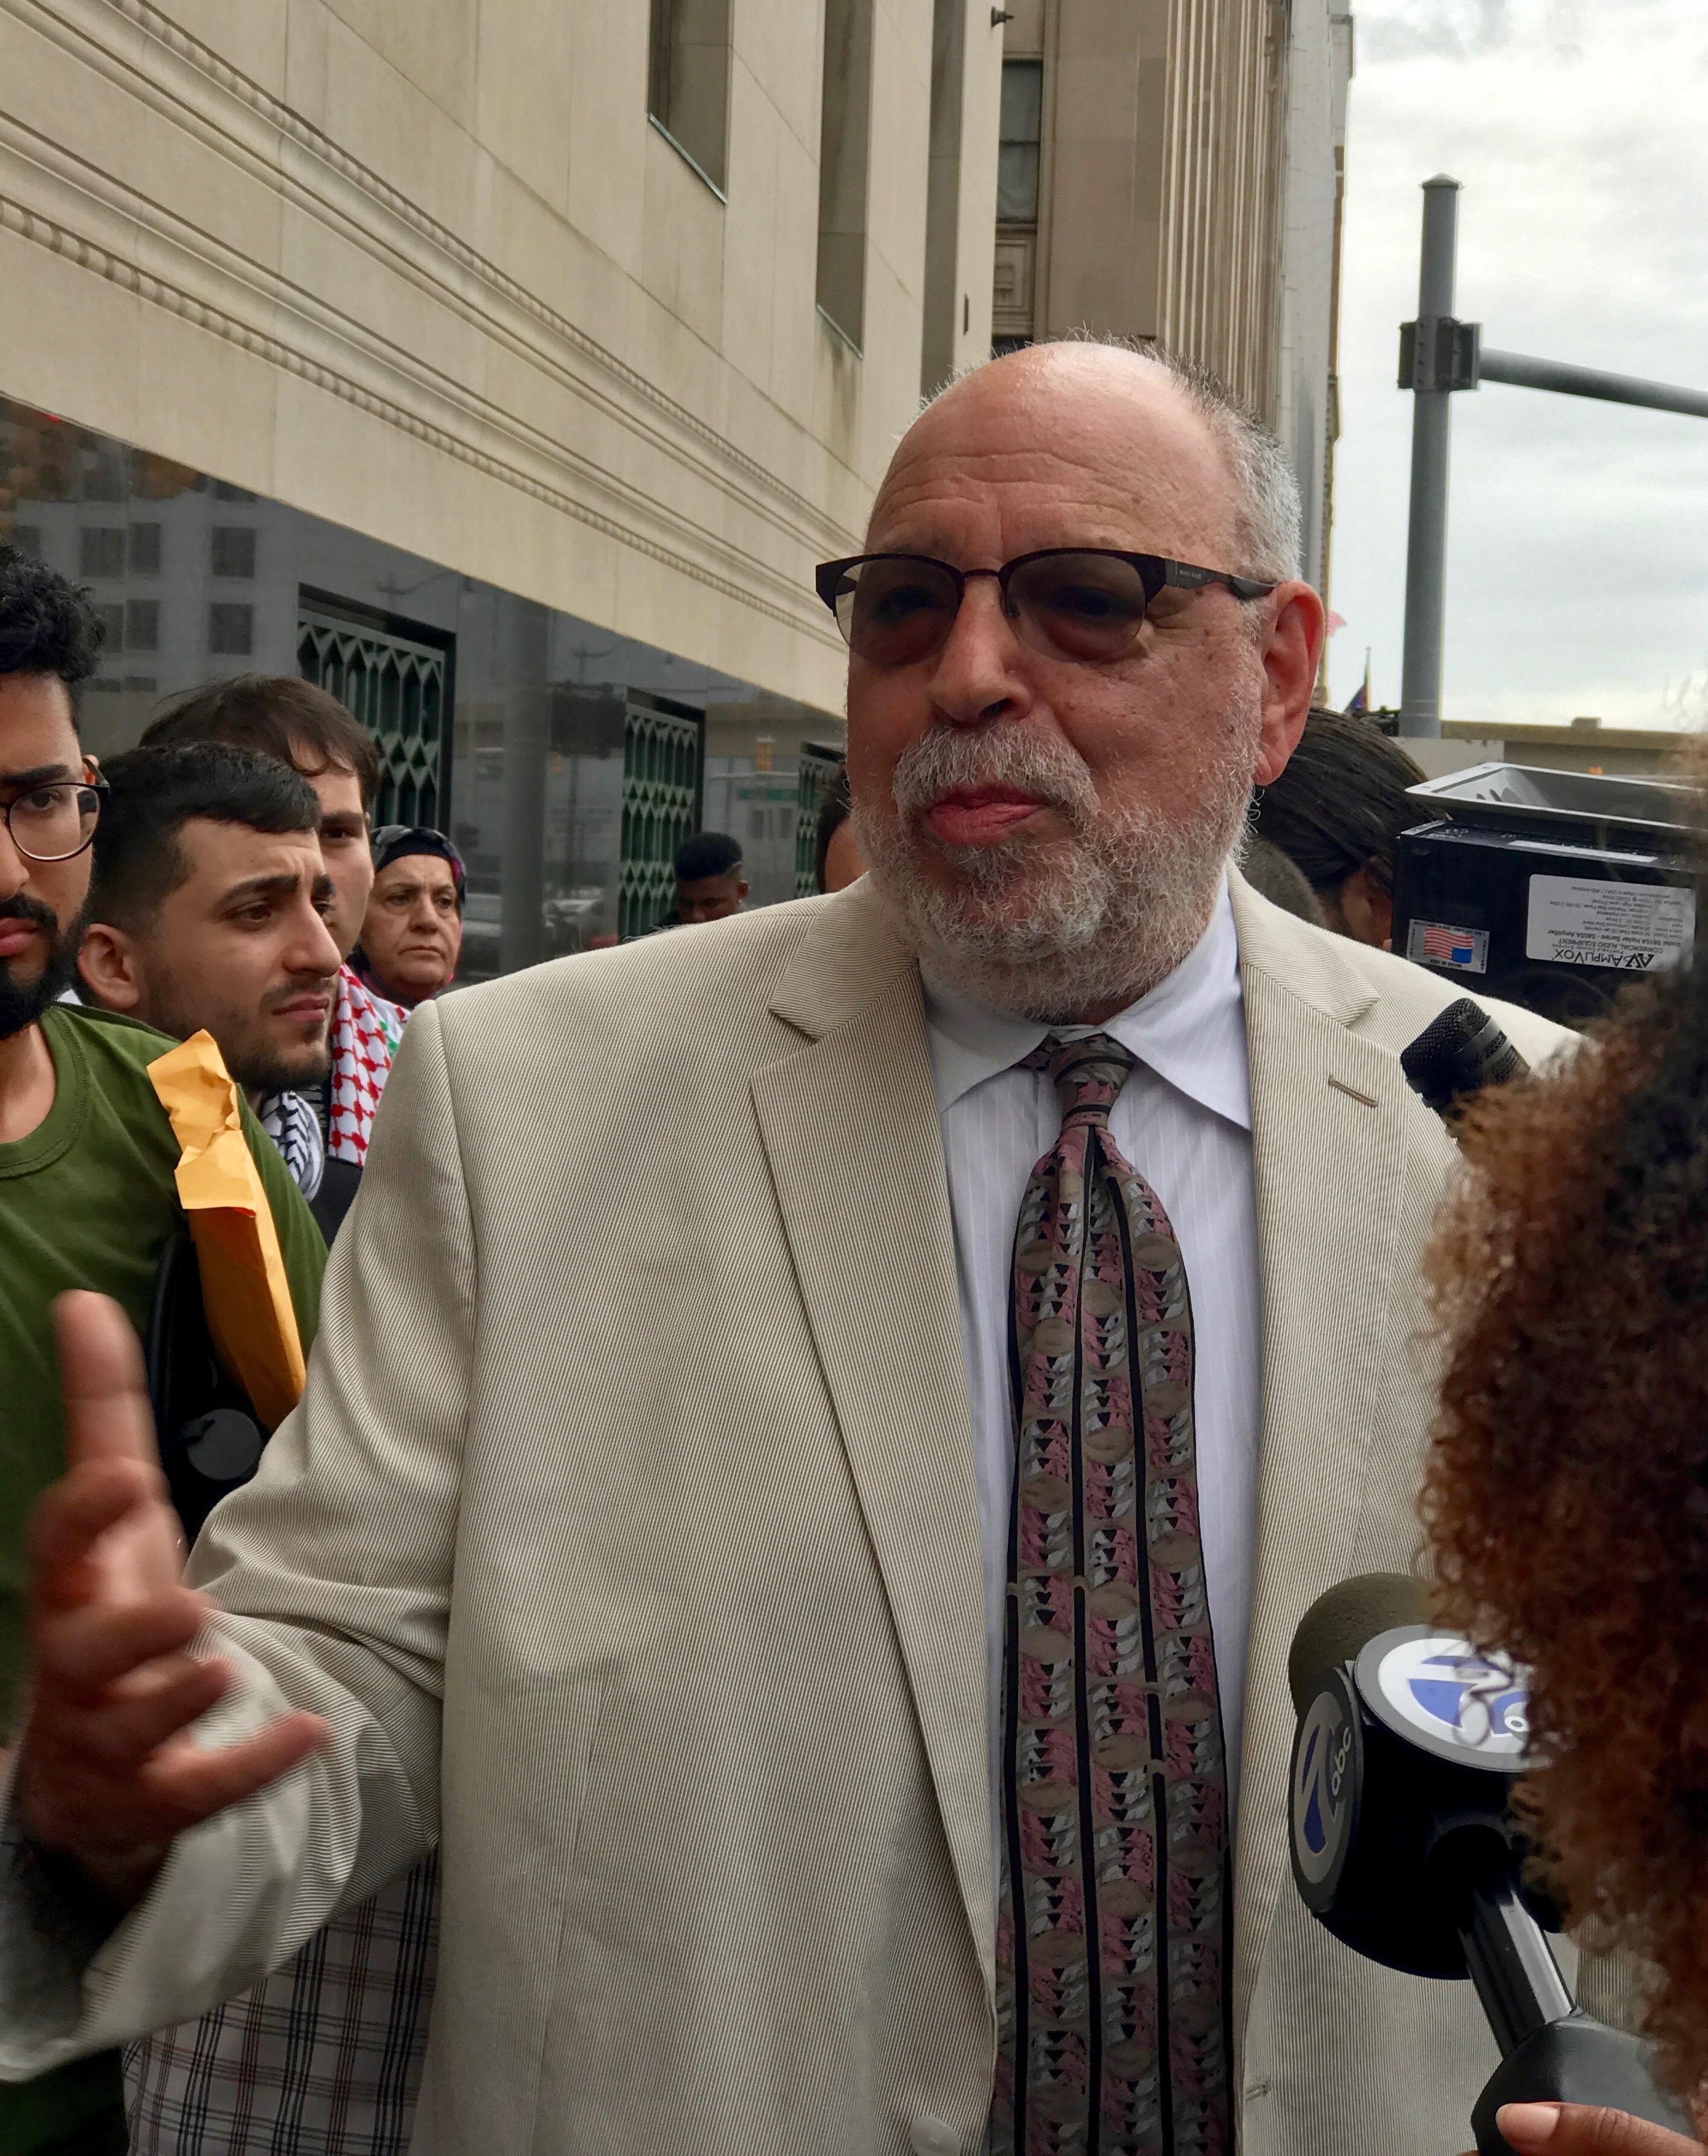 Michael Deutsch speaking to reporters. (Photo by Bill Chambers)